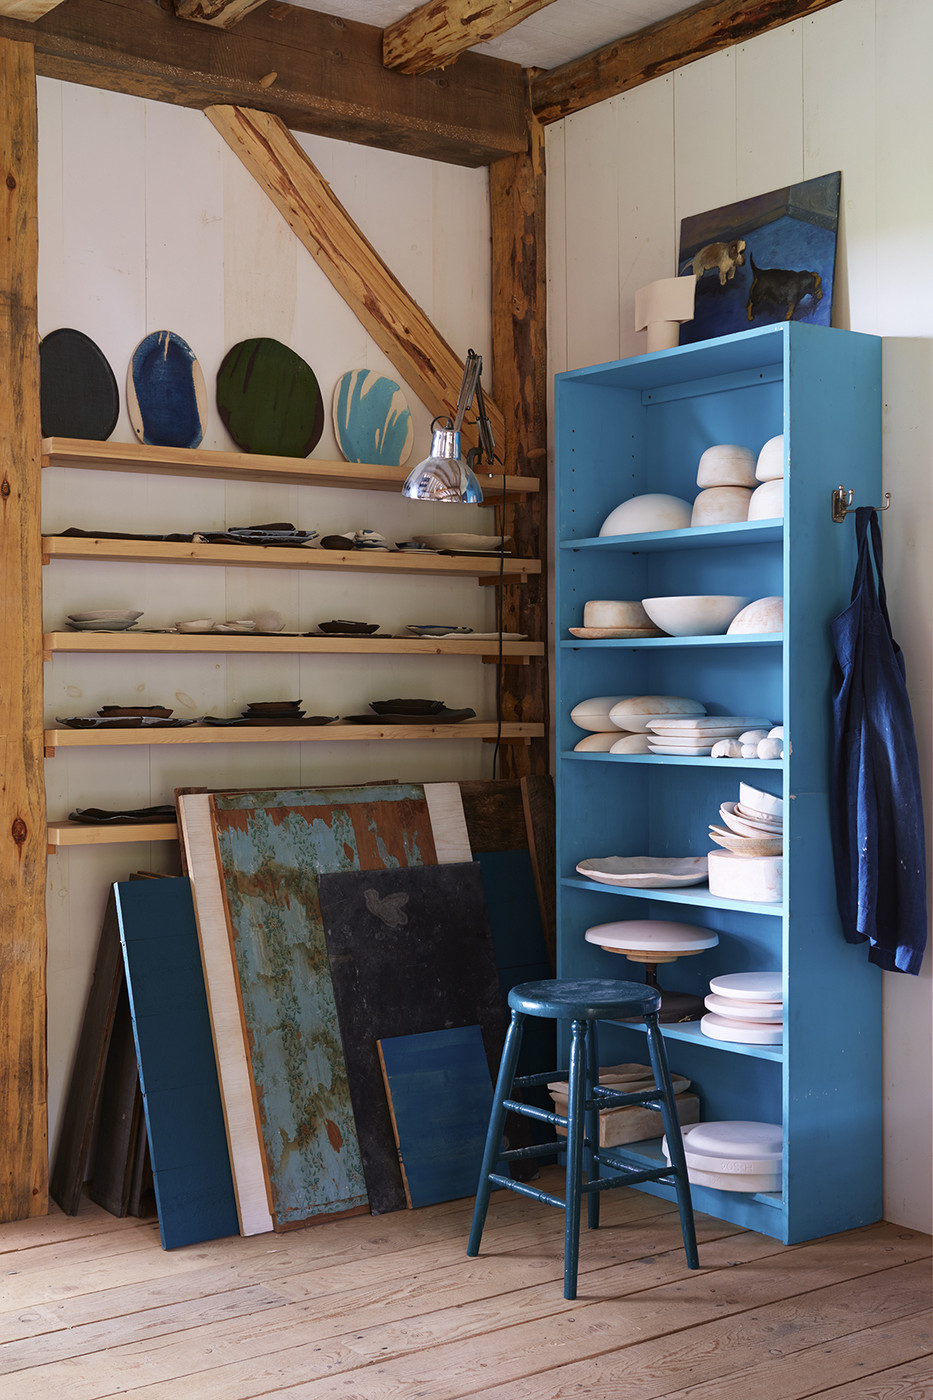 Two sets of shelves meet to create corner shelving